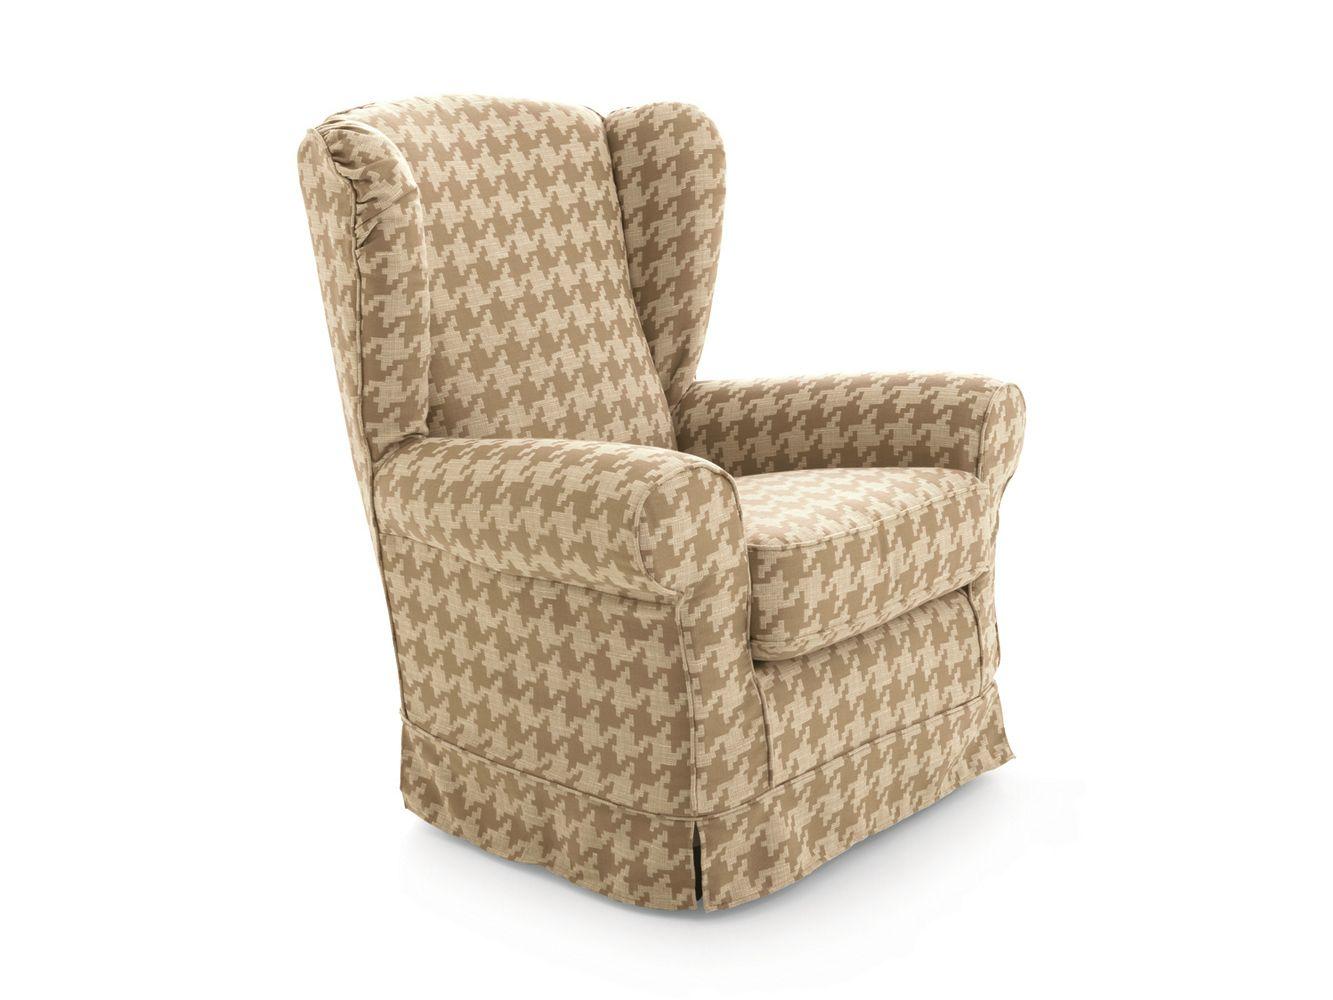 Sill n orejero by scandola mobili for Sillones de tela baratos